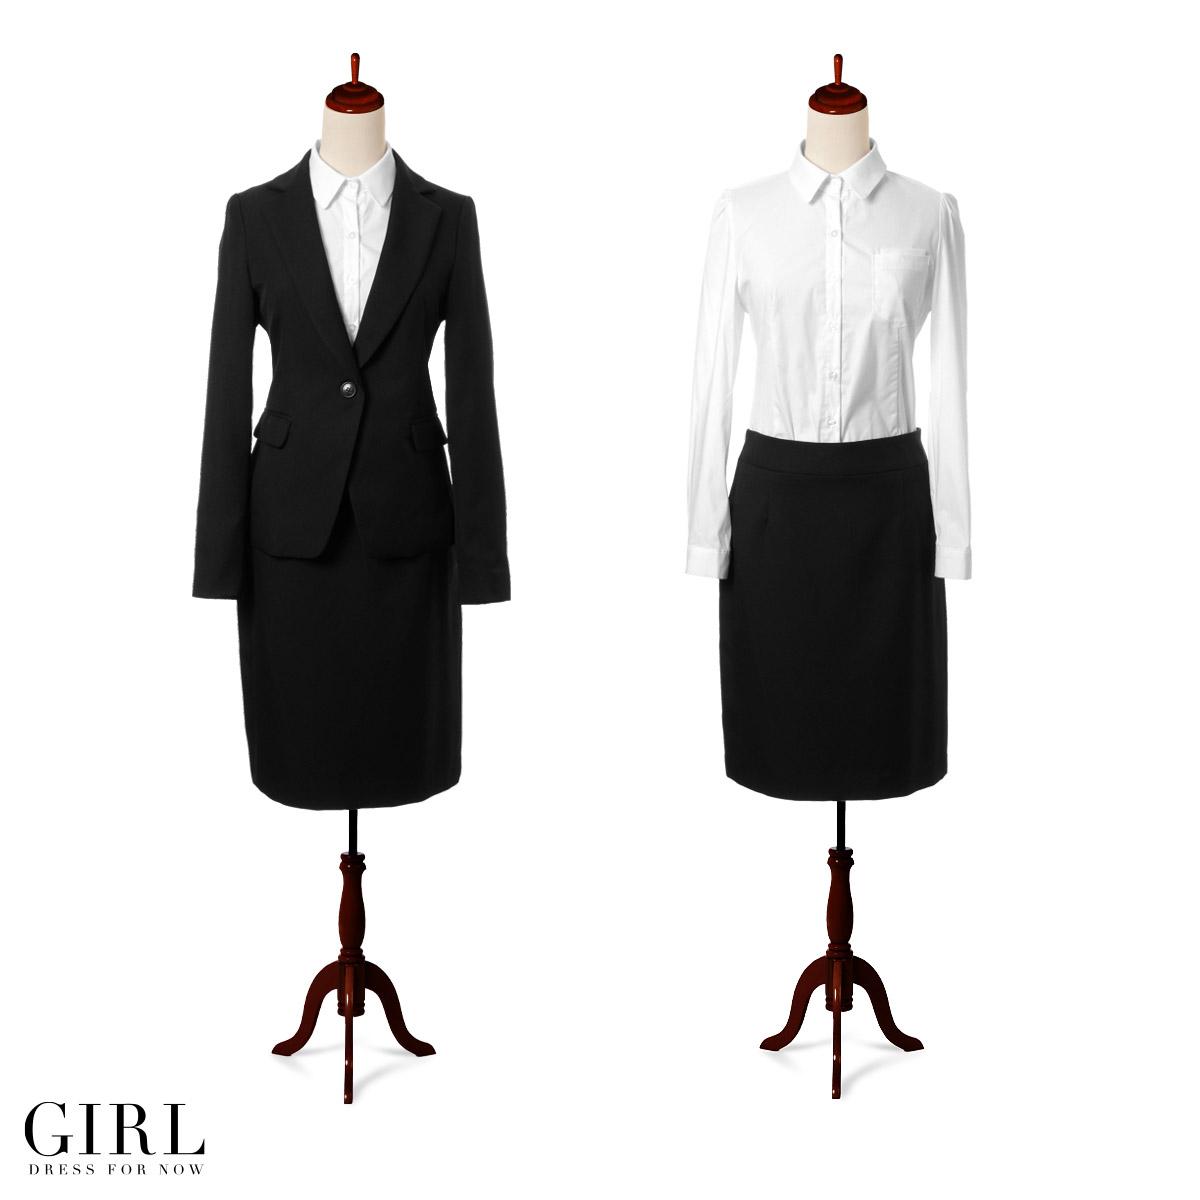 Dress Shop Girl Suits Women S Three Point Set Formal Suit Jacket